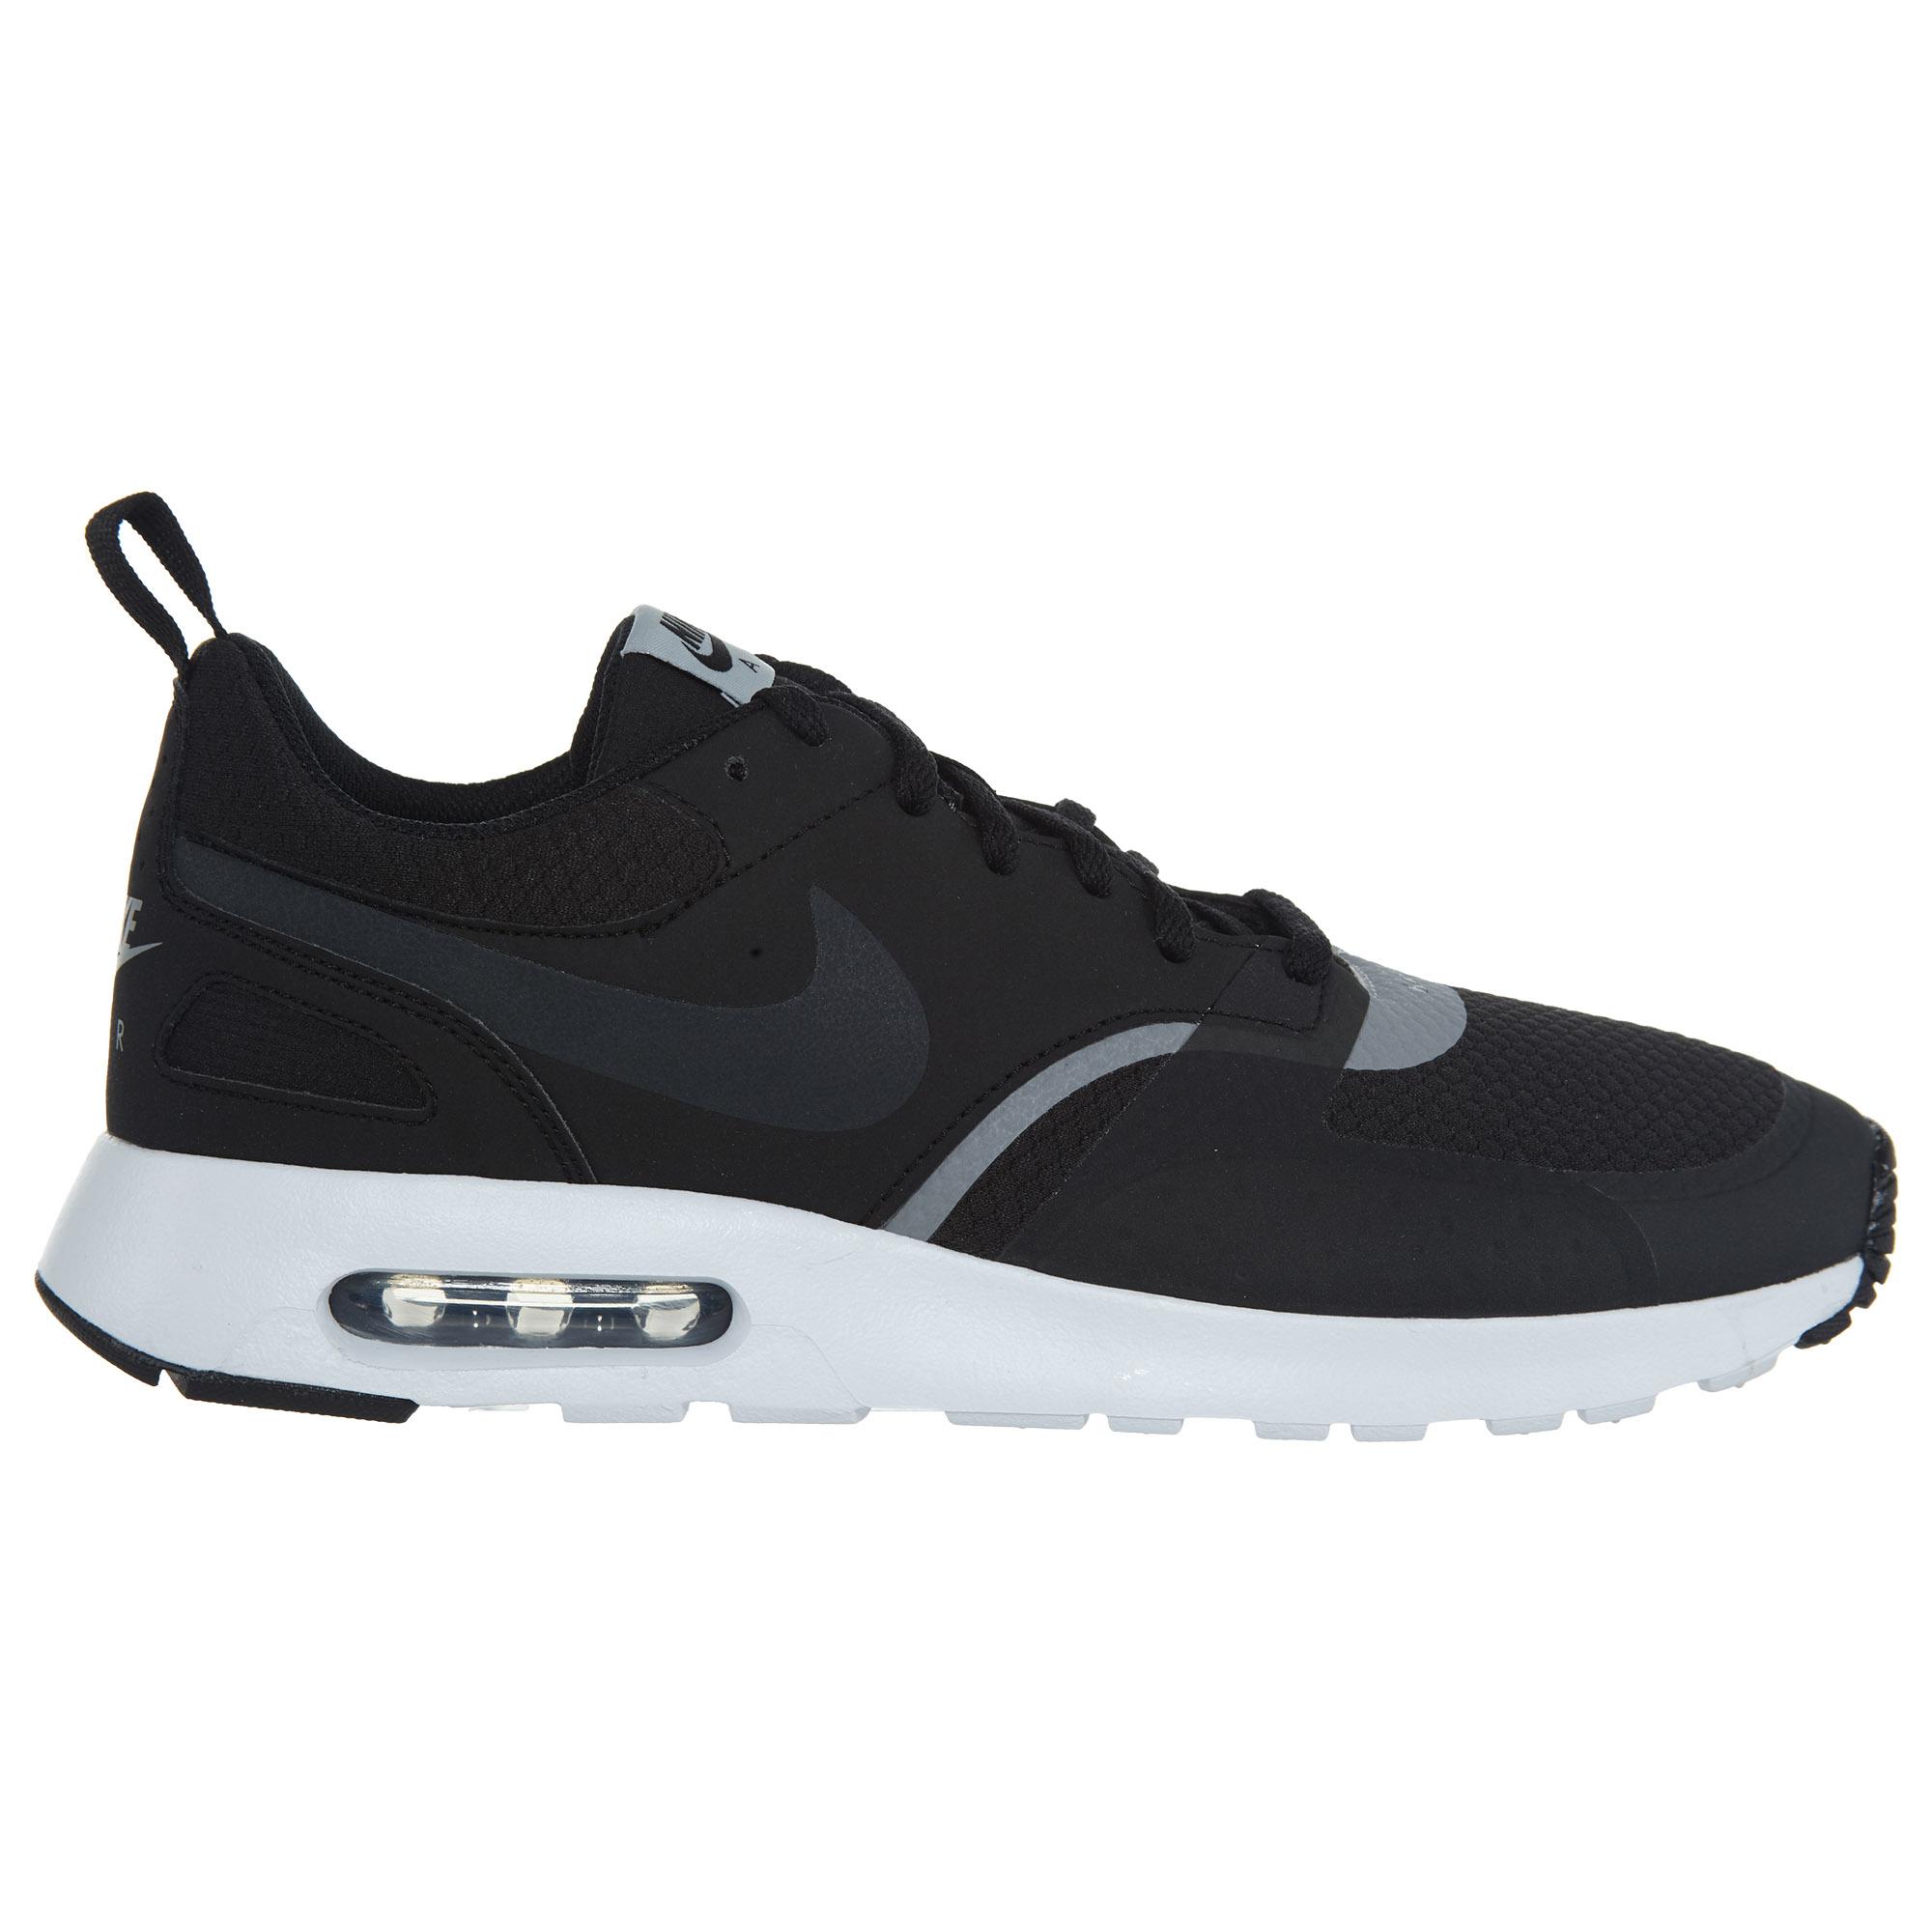 Nike Air Max Vision Black/Anthracite